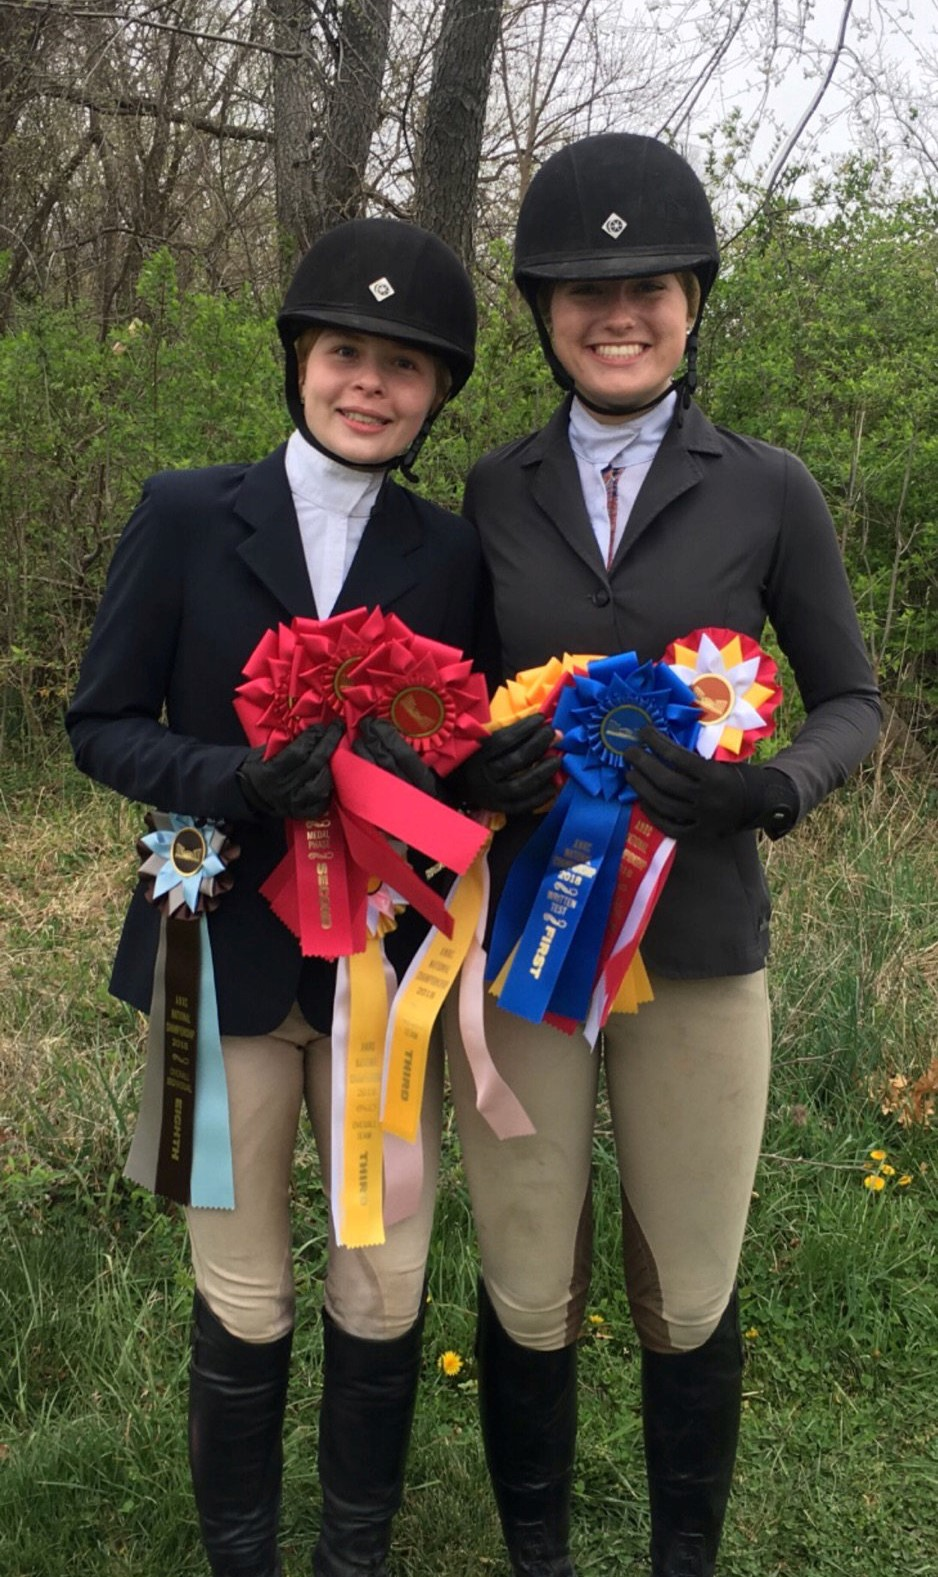 Whitestone Farm Ribbons and Rider